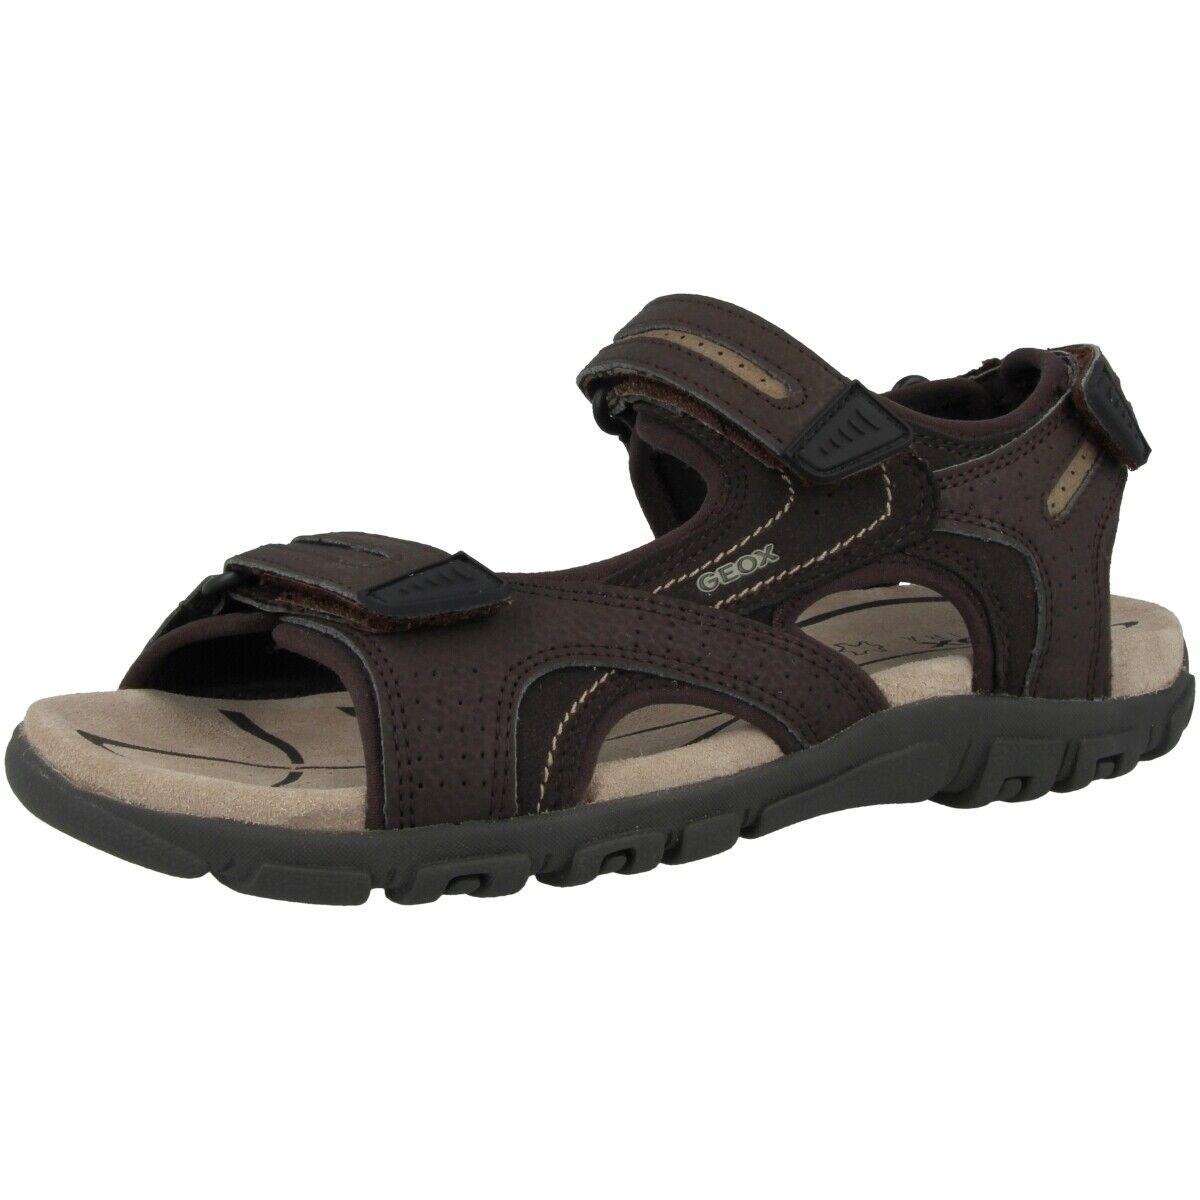 Geox u s. Strada d zapatos caballero sandalias trekking sandalias u8224d050auc0705